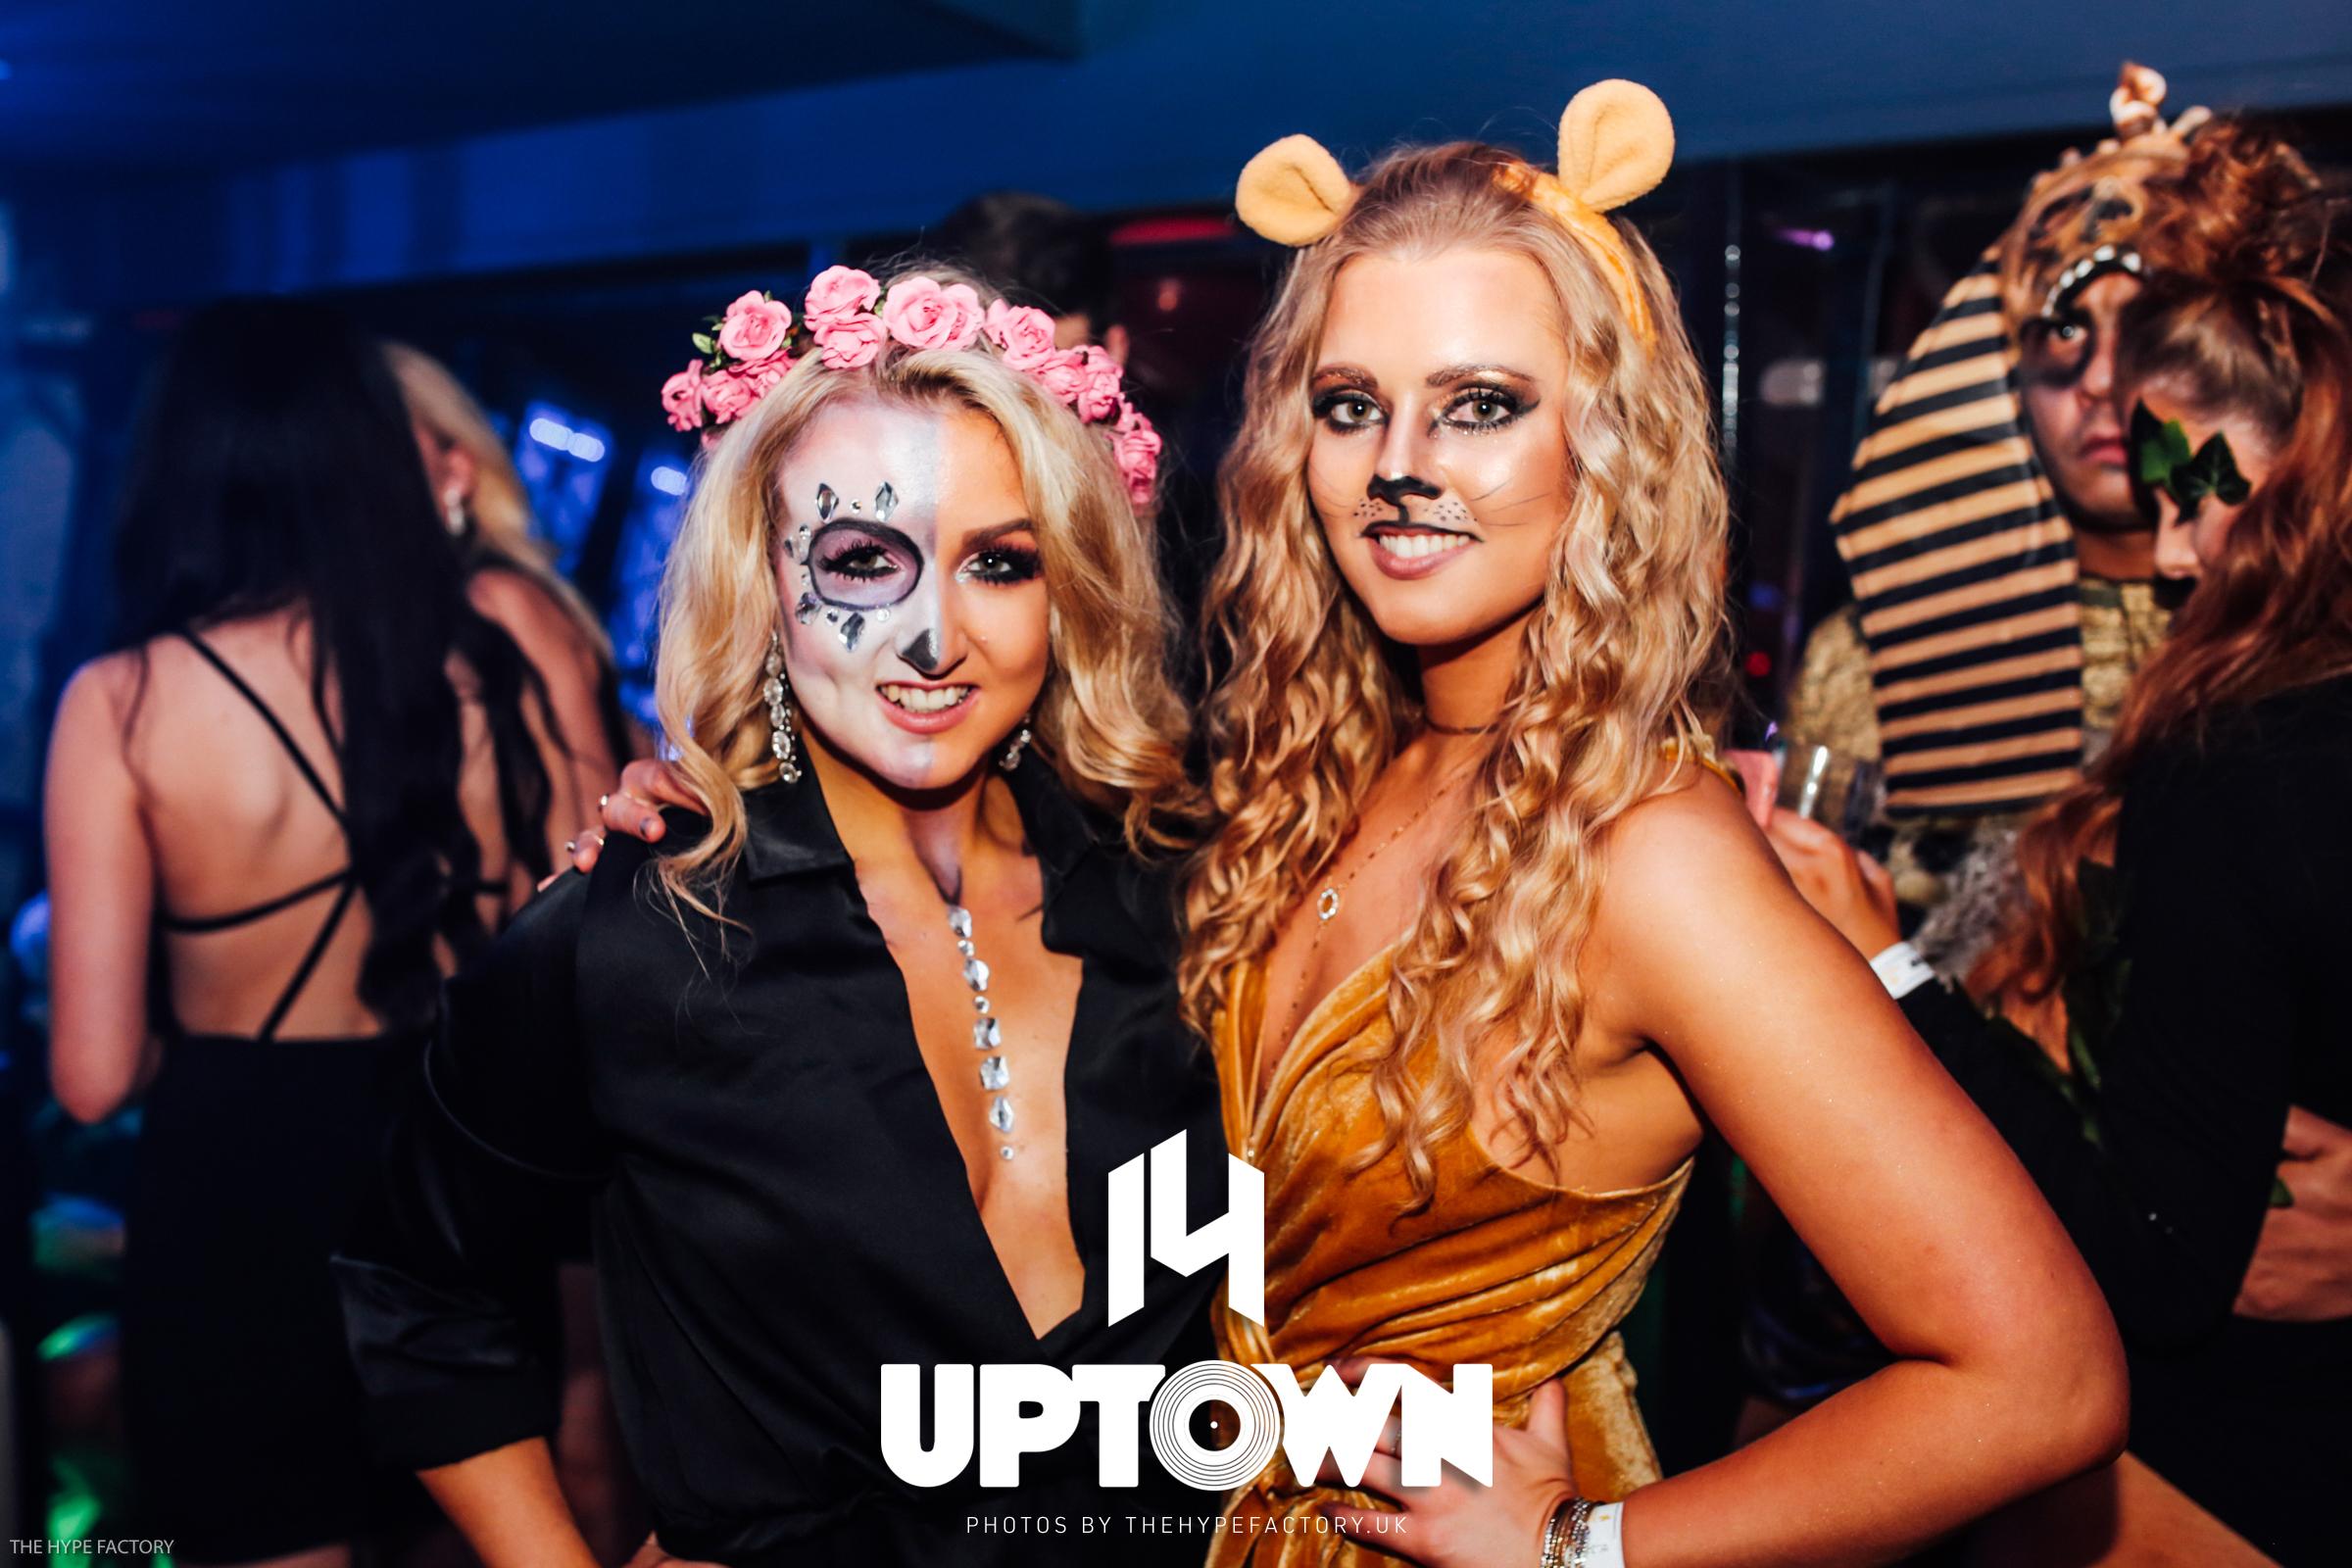 uptown-10.jpg